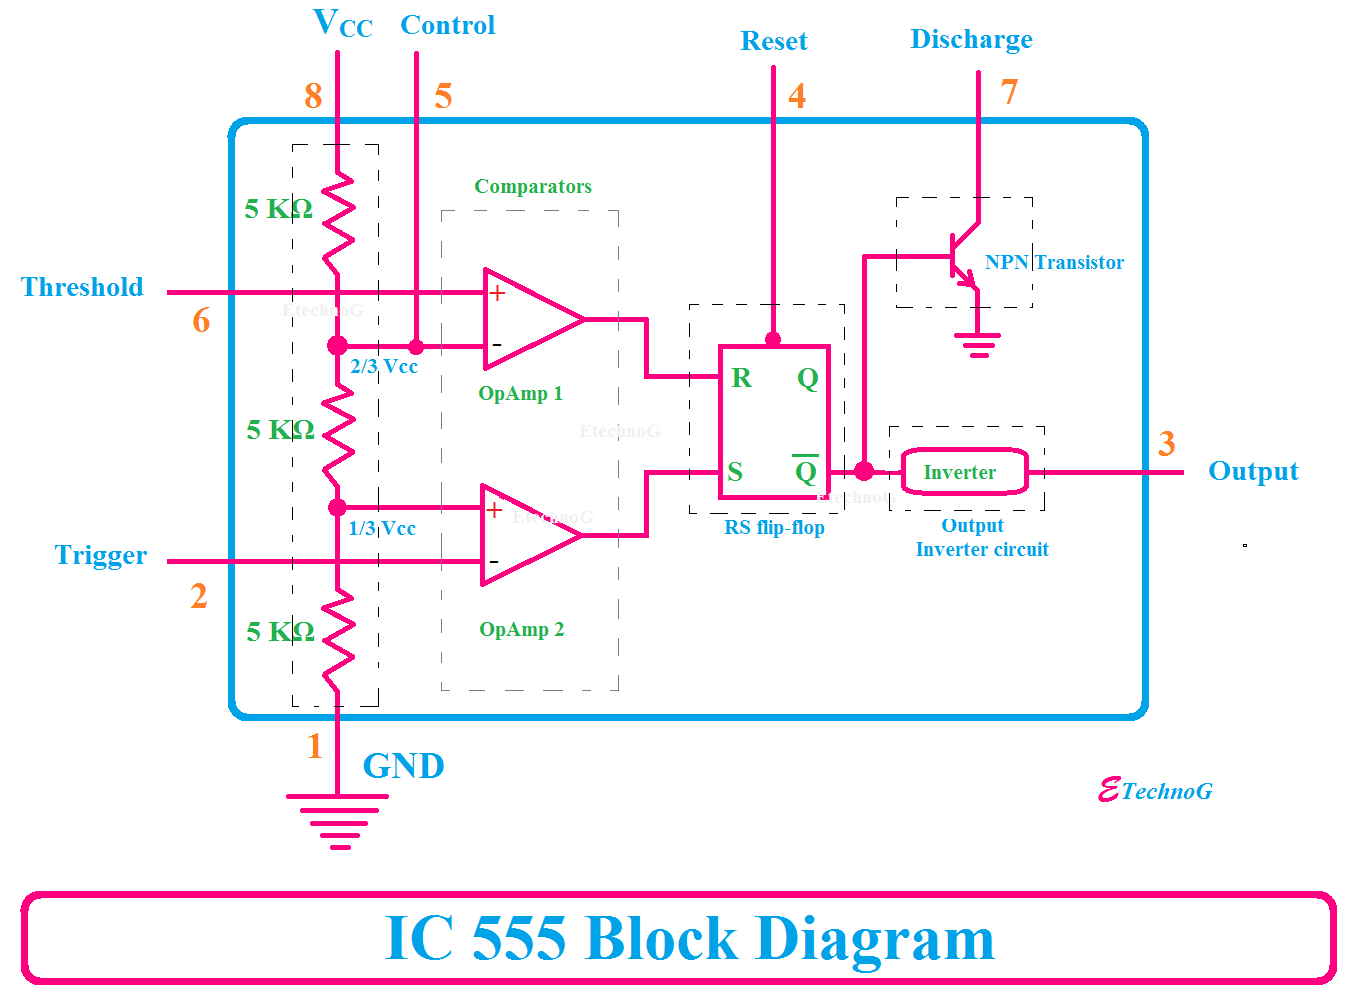 Ic 555 Internal Circuit Diagram | Ic 555 Circuit Diagram Www Tollebild Com